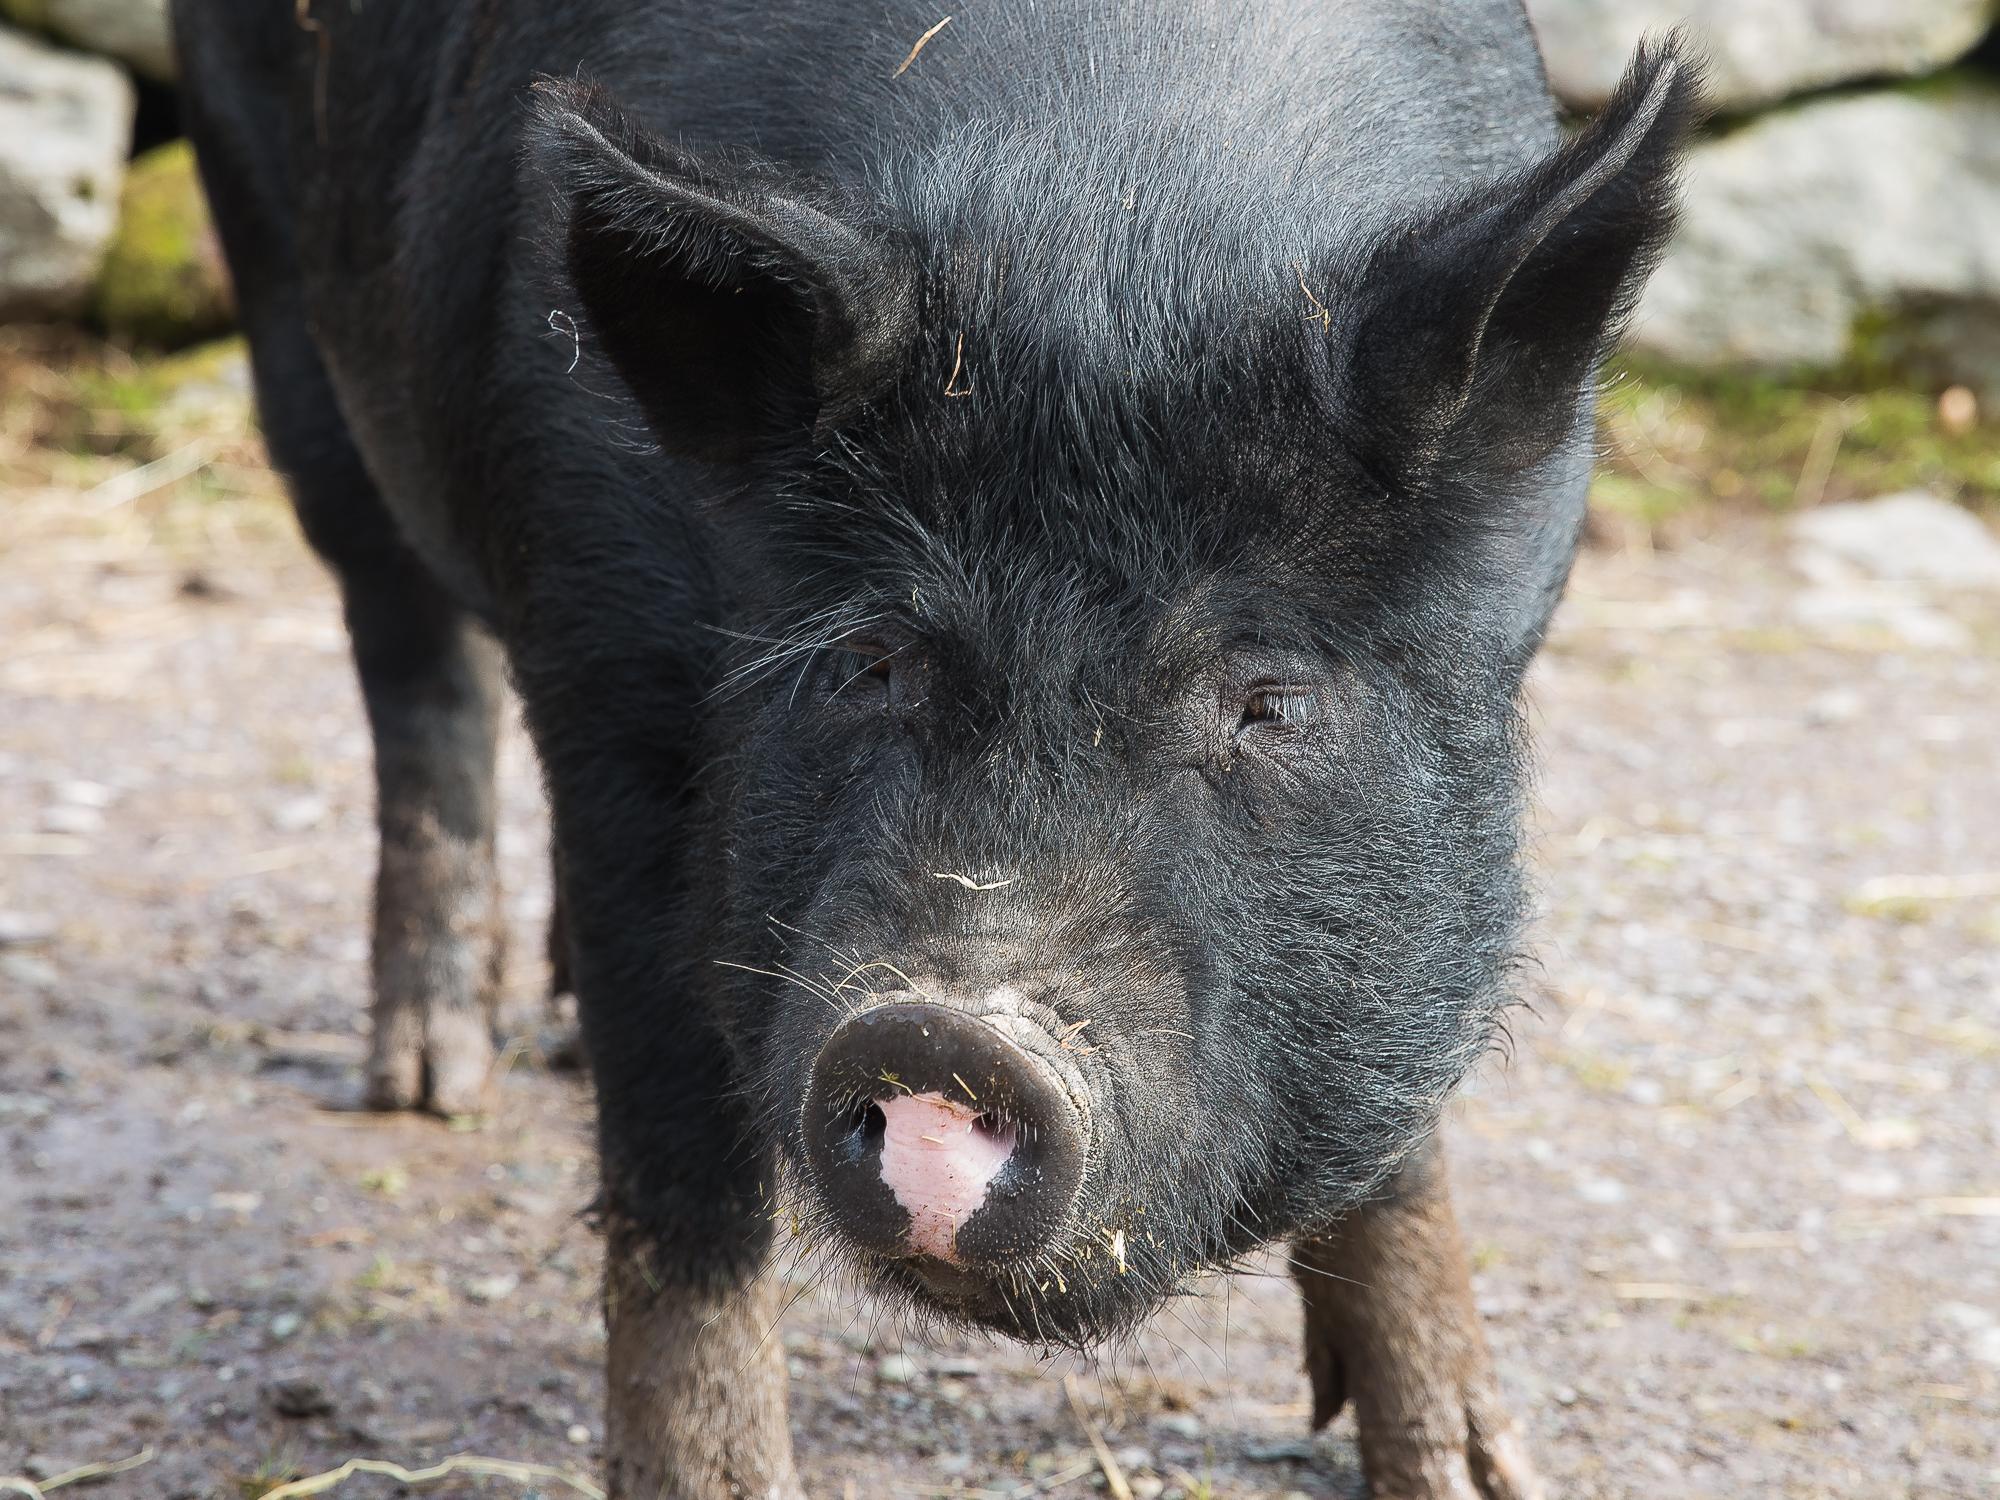 A black pig shows off its pink snout